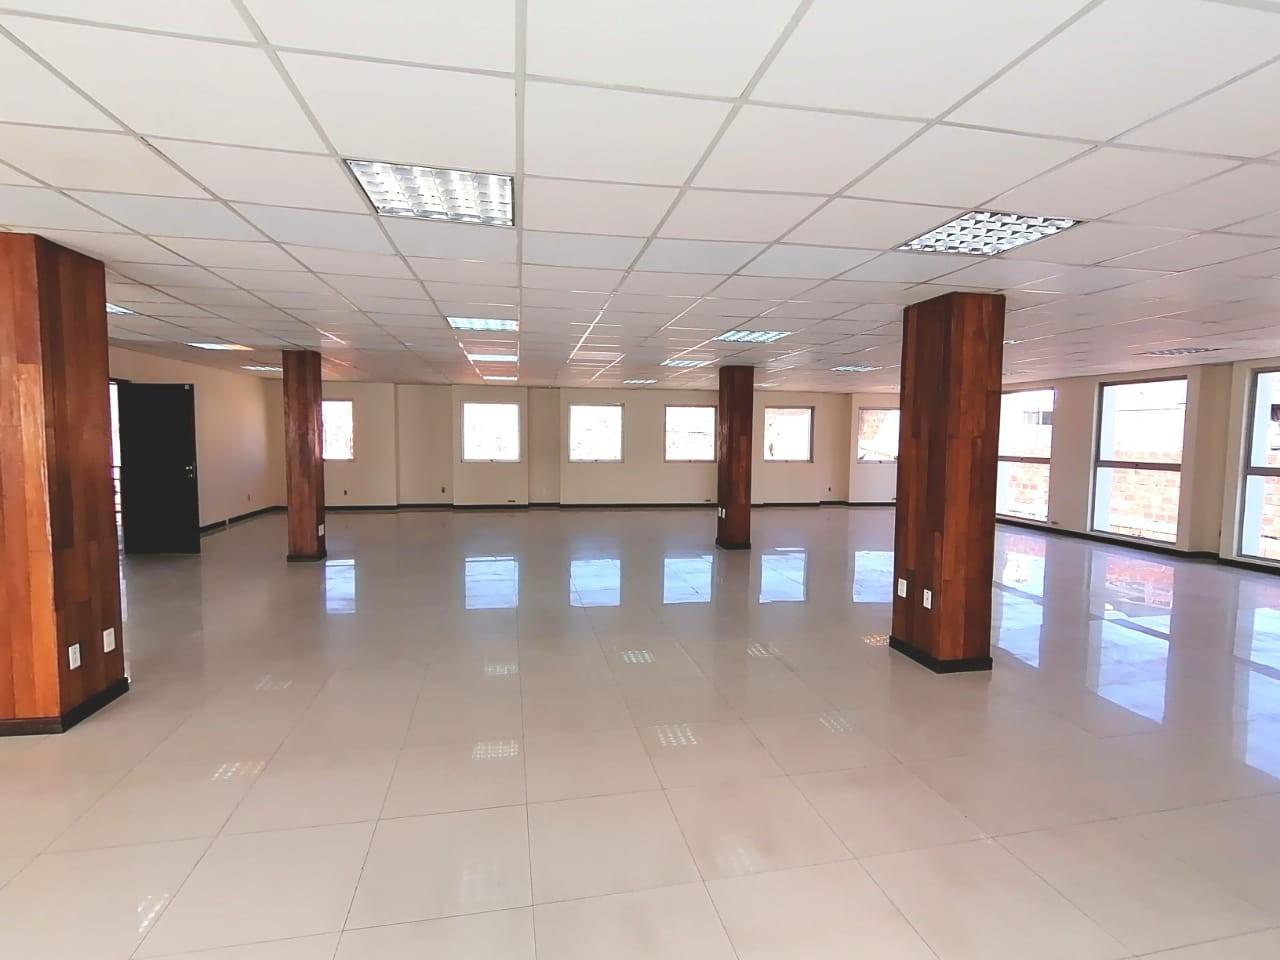 Oficina en Alquiler OFICINA EN ALQUILER 300 mtrs  CALLE SUCRE Foto 4